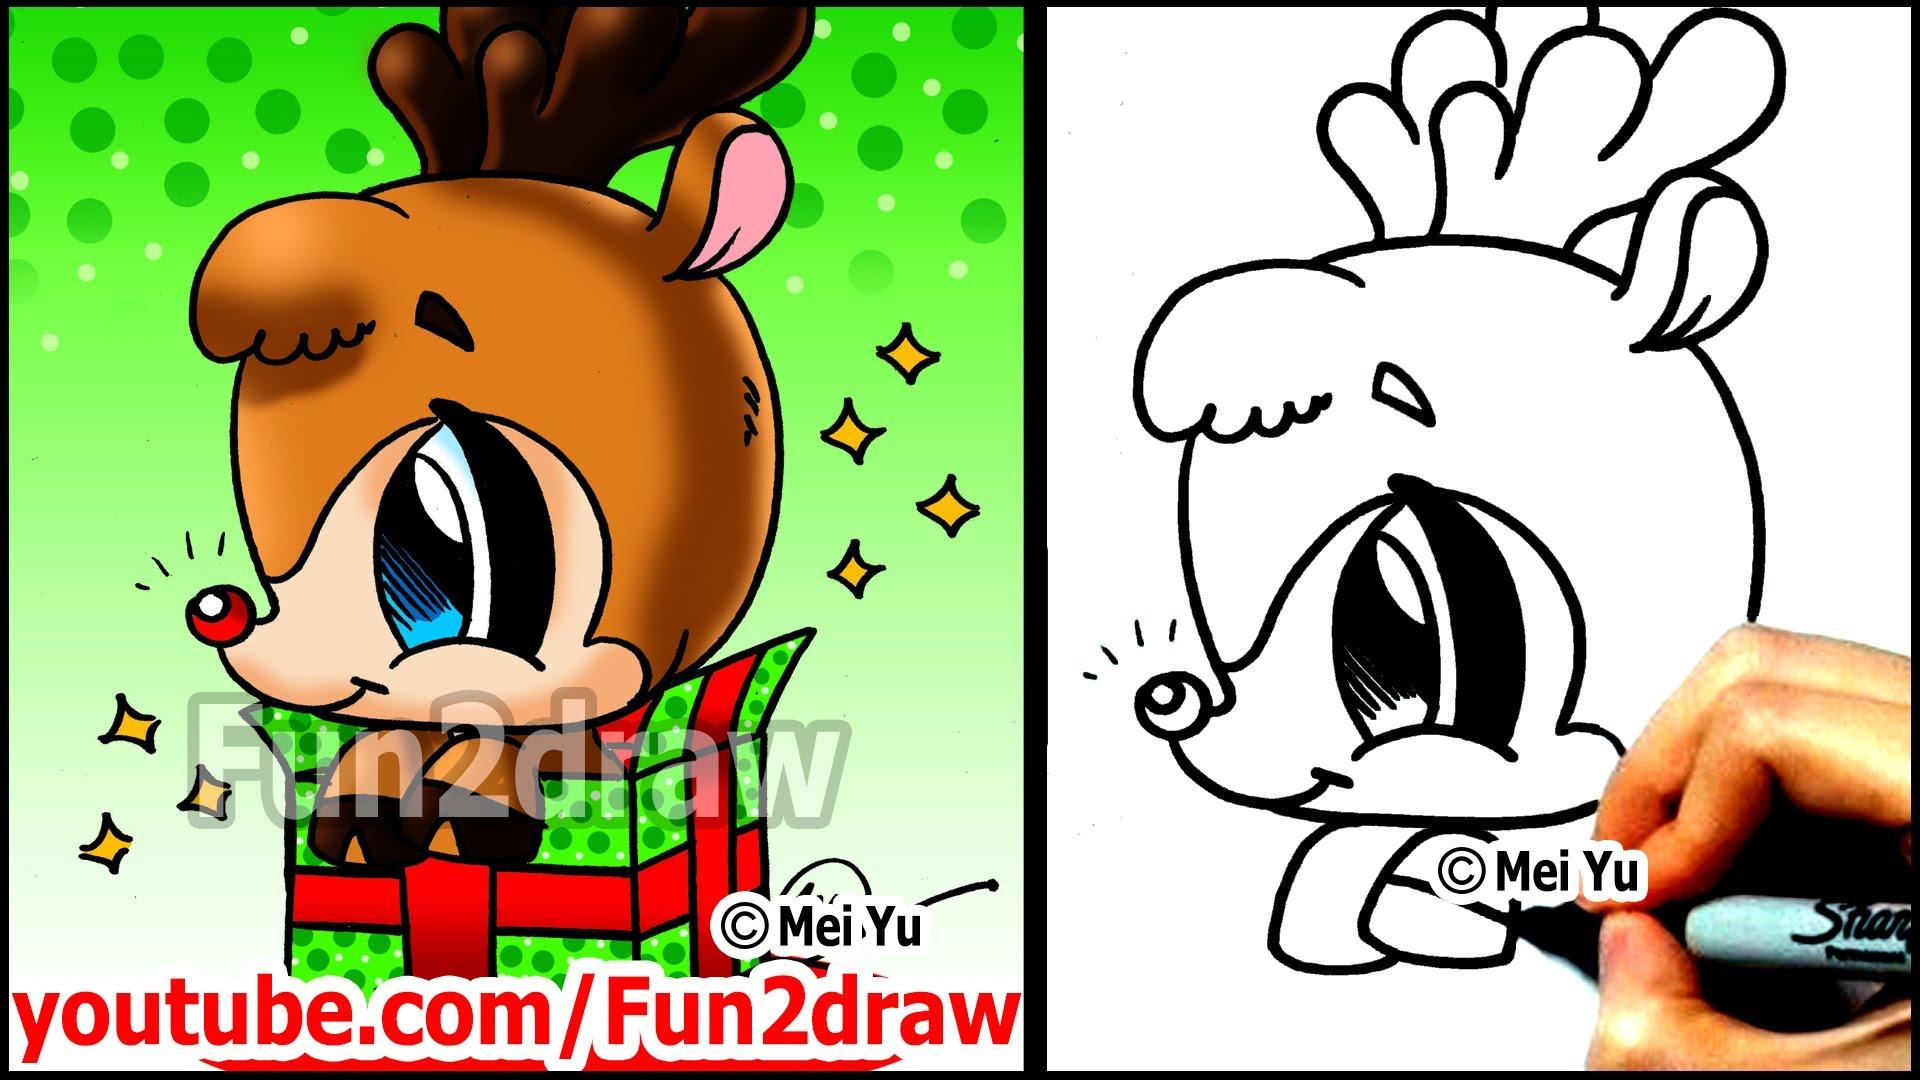 Drawn santa fun2draw How a Gift Draw Winter